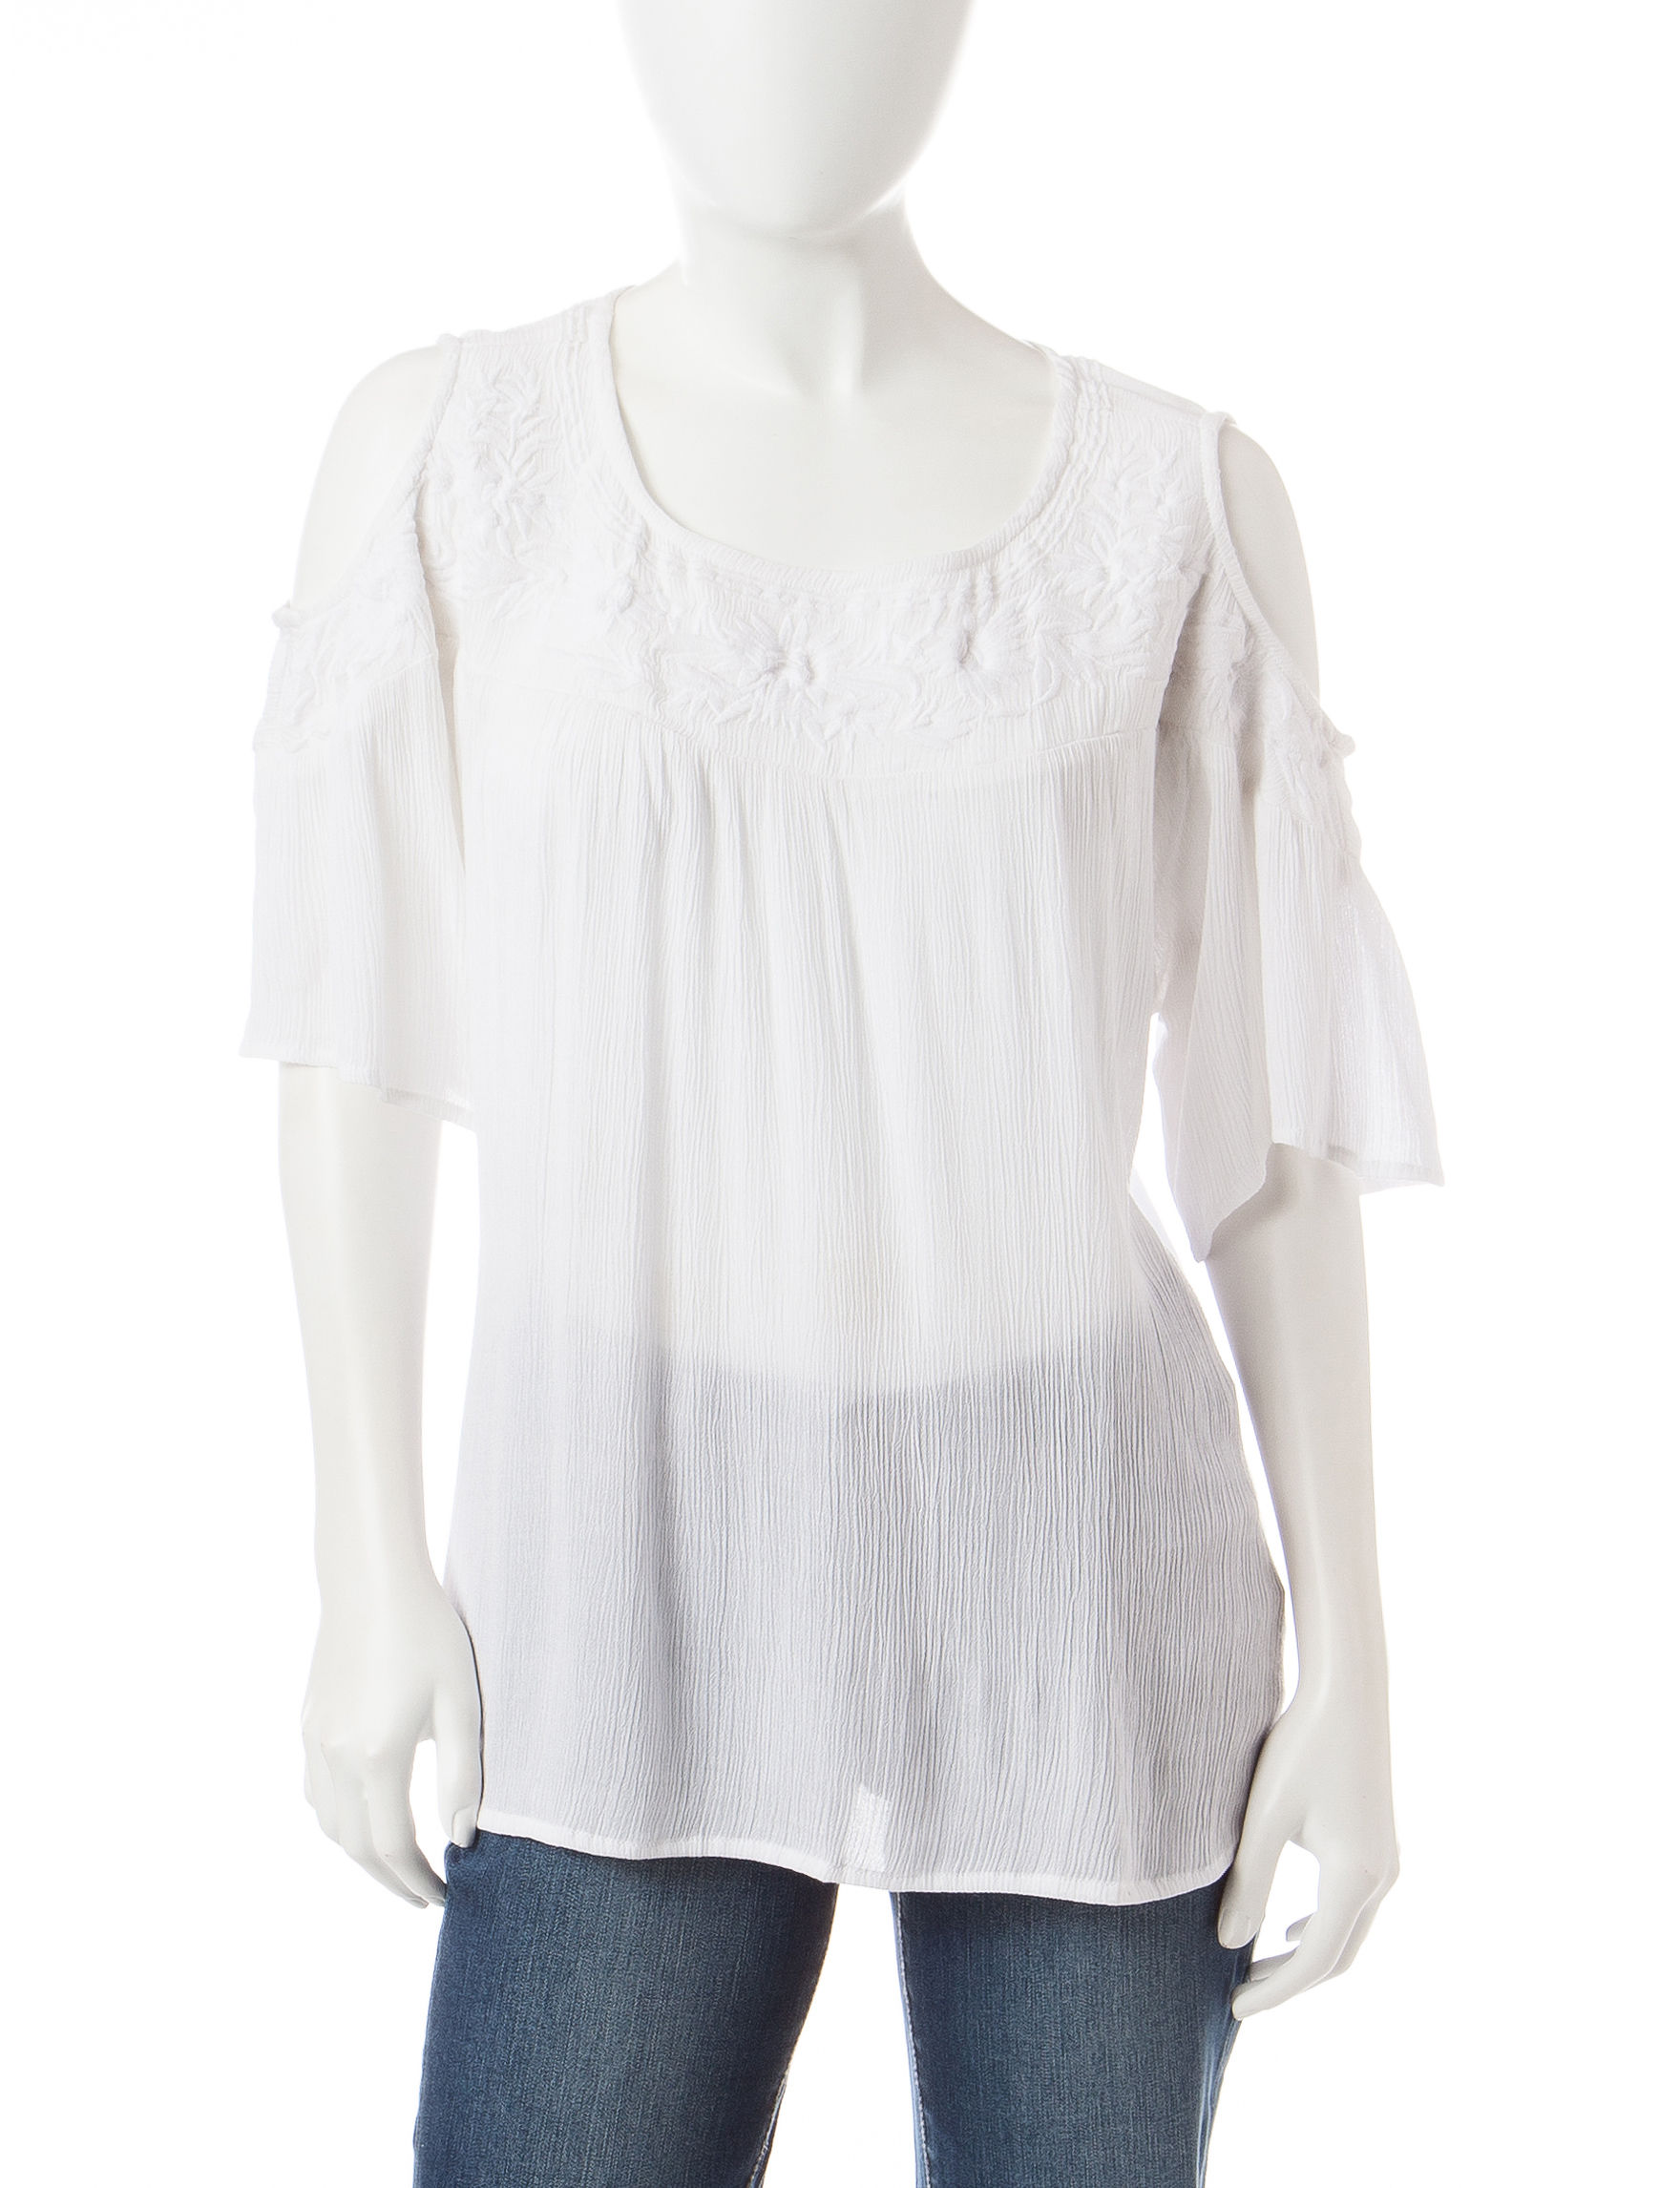 Signature Studio Off White Shirts & Blouses